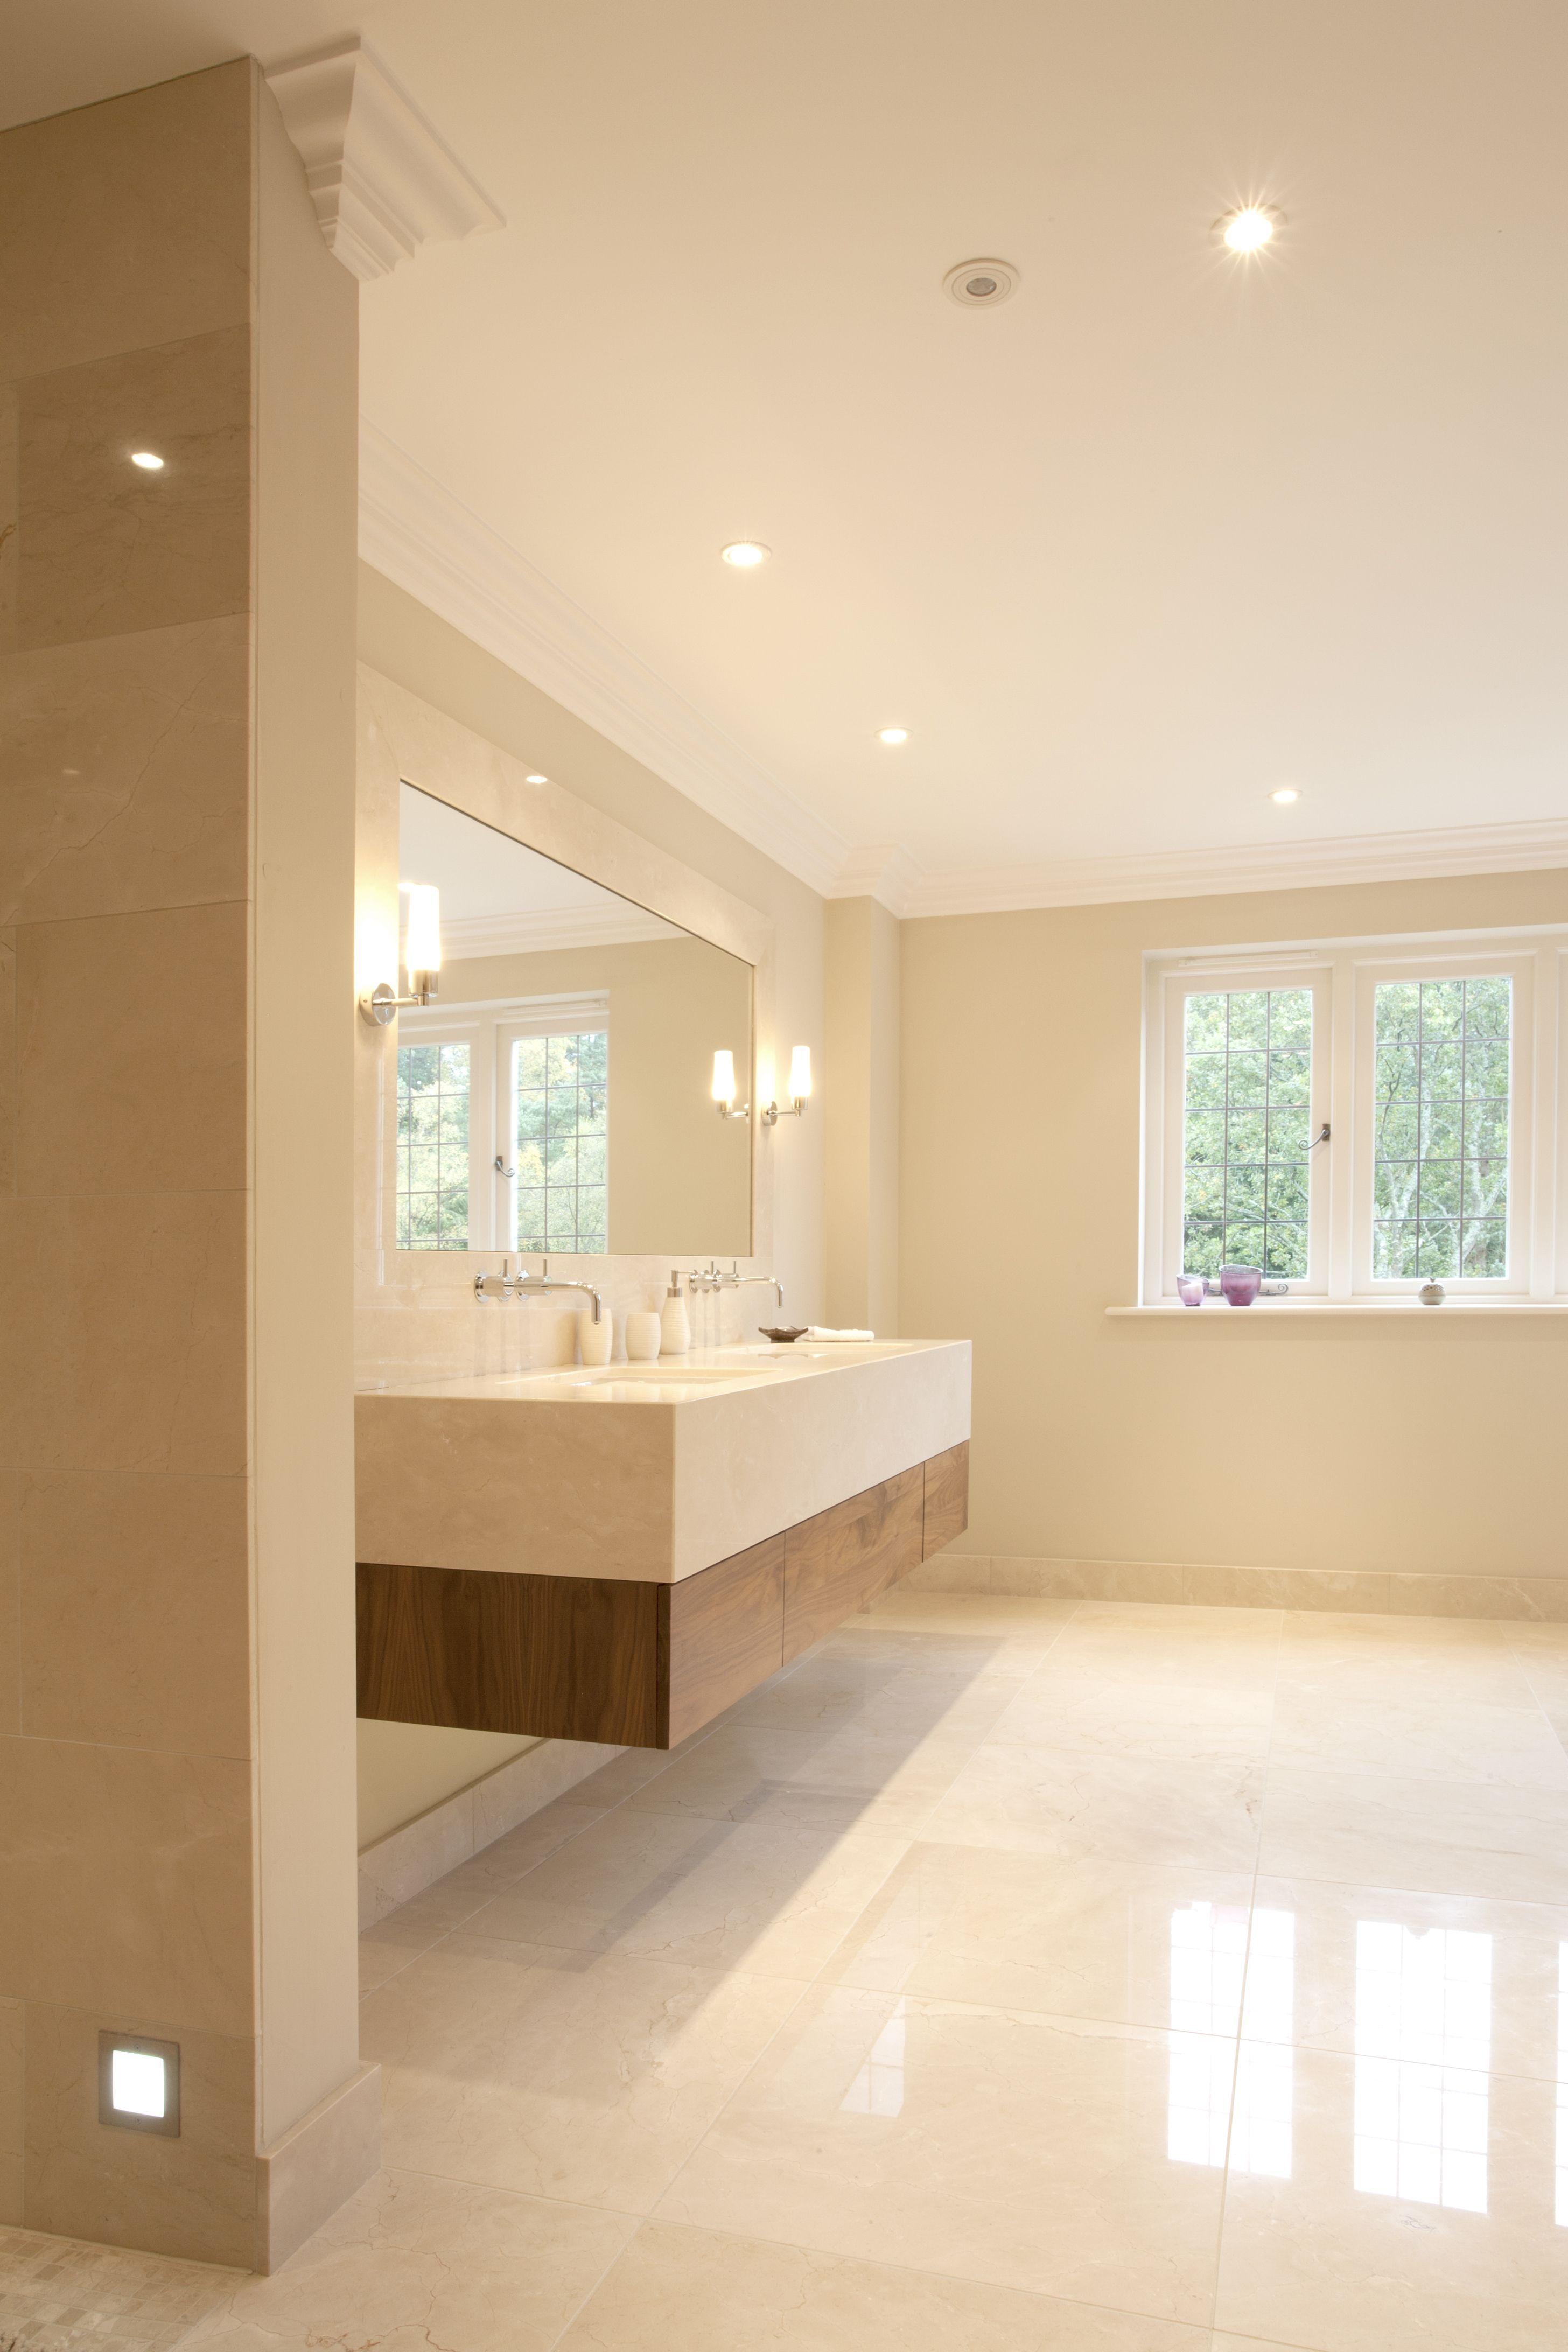 Crema Marfil As A Bathroom Tile Floor And Walls In 2020 Marble Bathroom Floor Tile Bathroom Marble Bathroom Designs